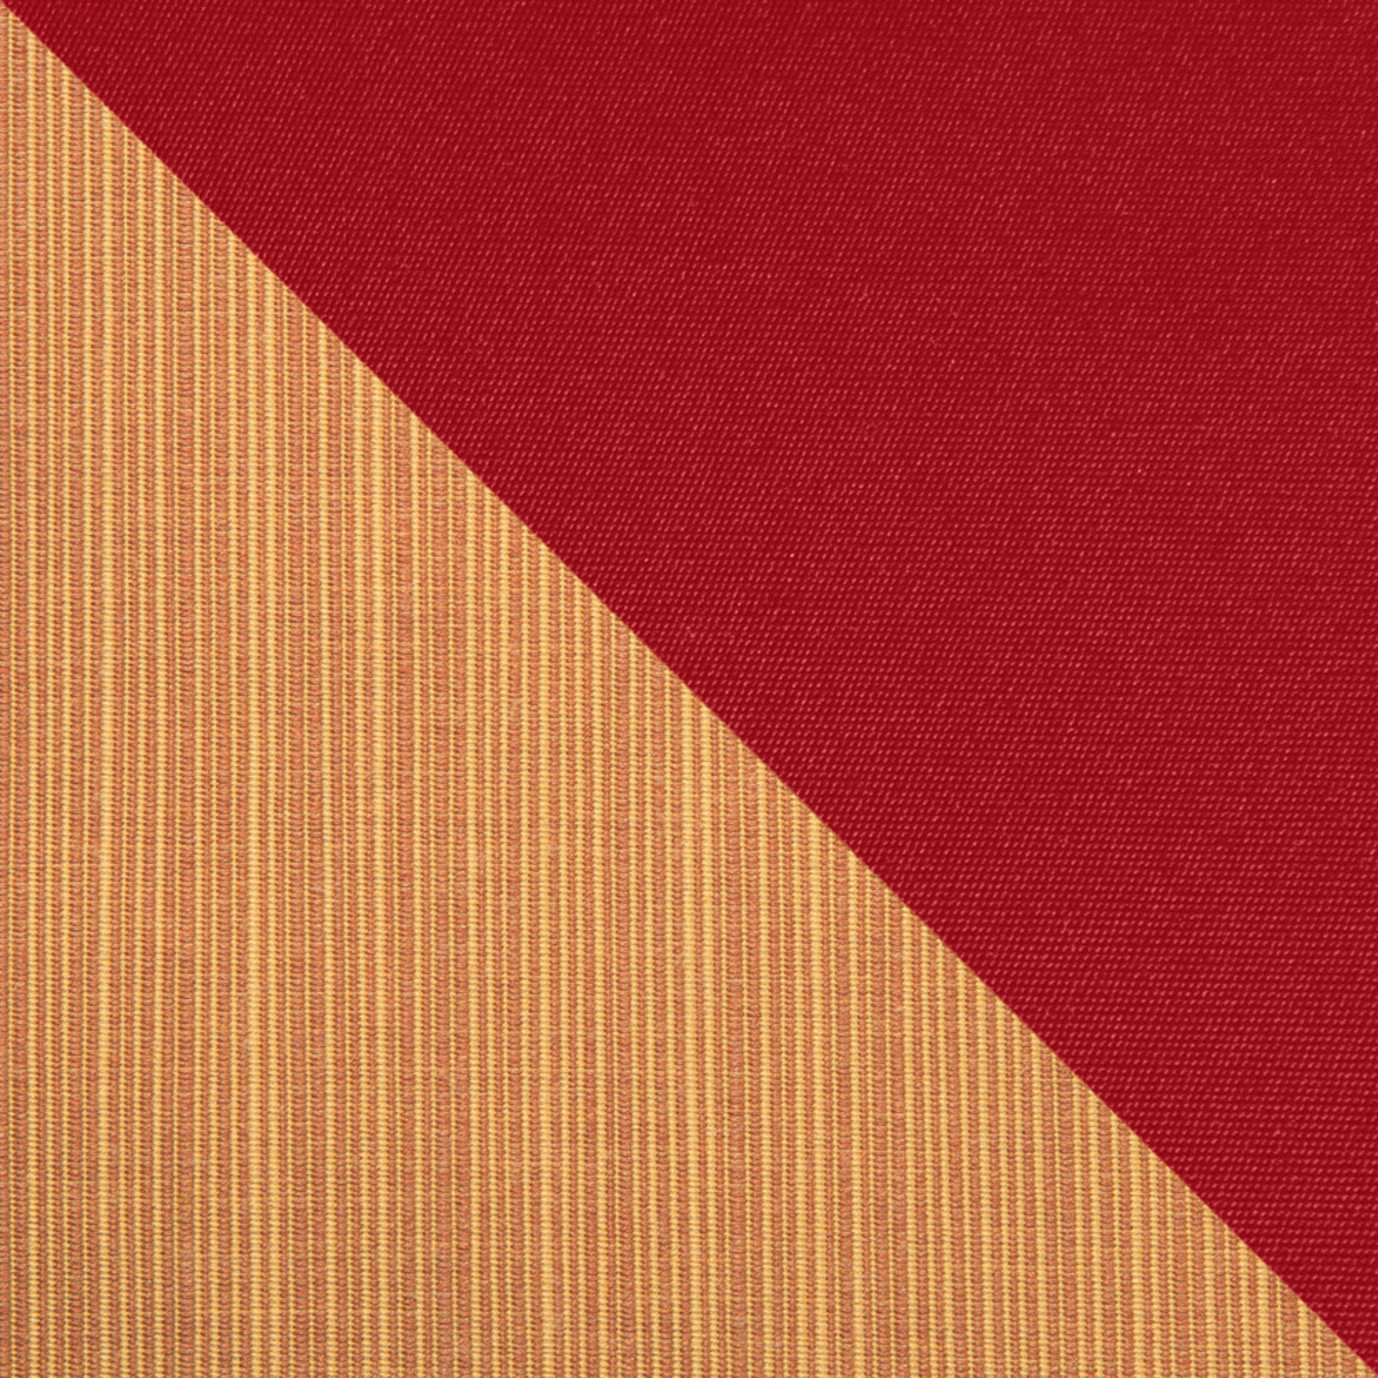 Deco™ Loveseat & Ottoman - Sunset Red